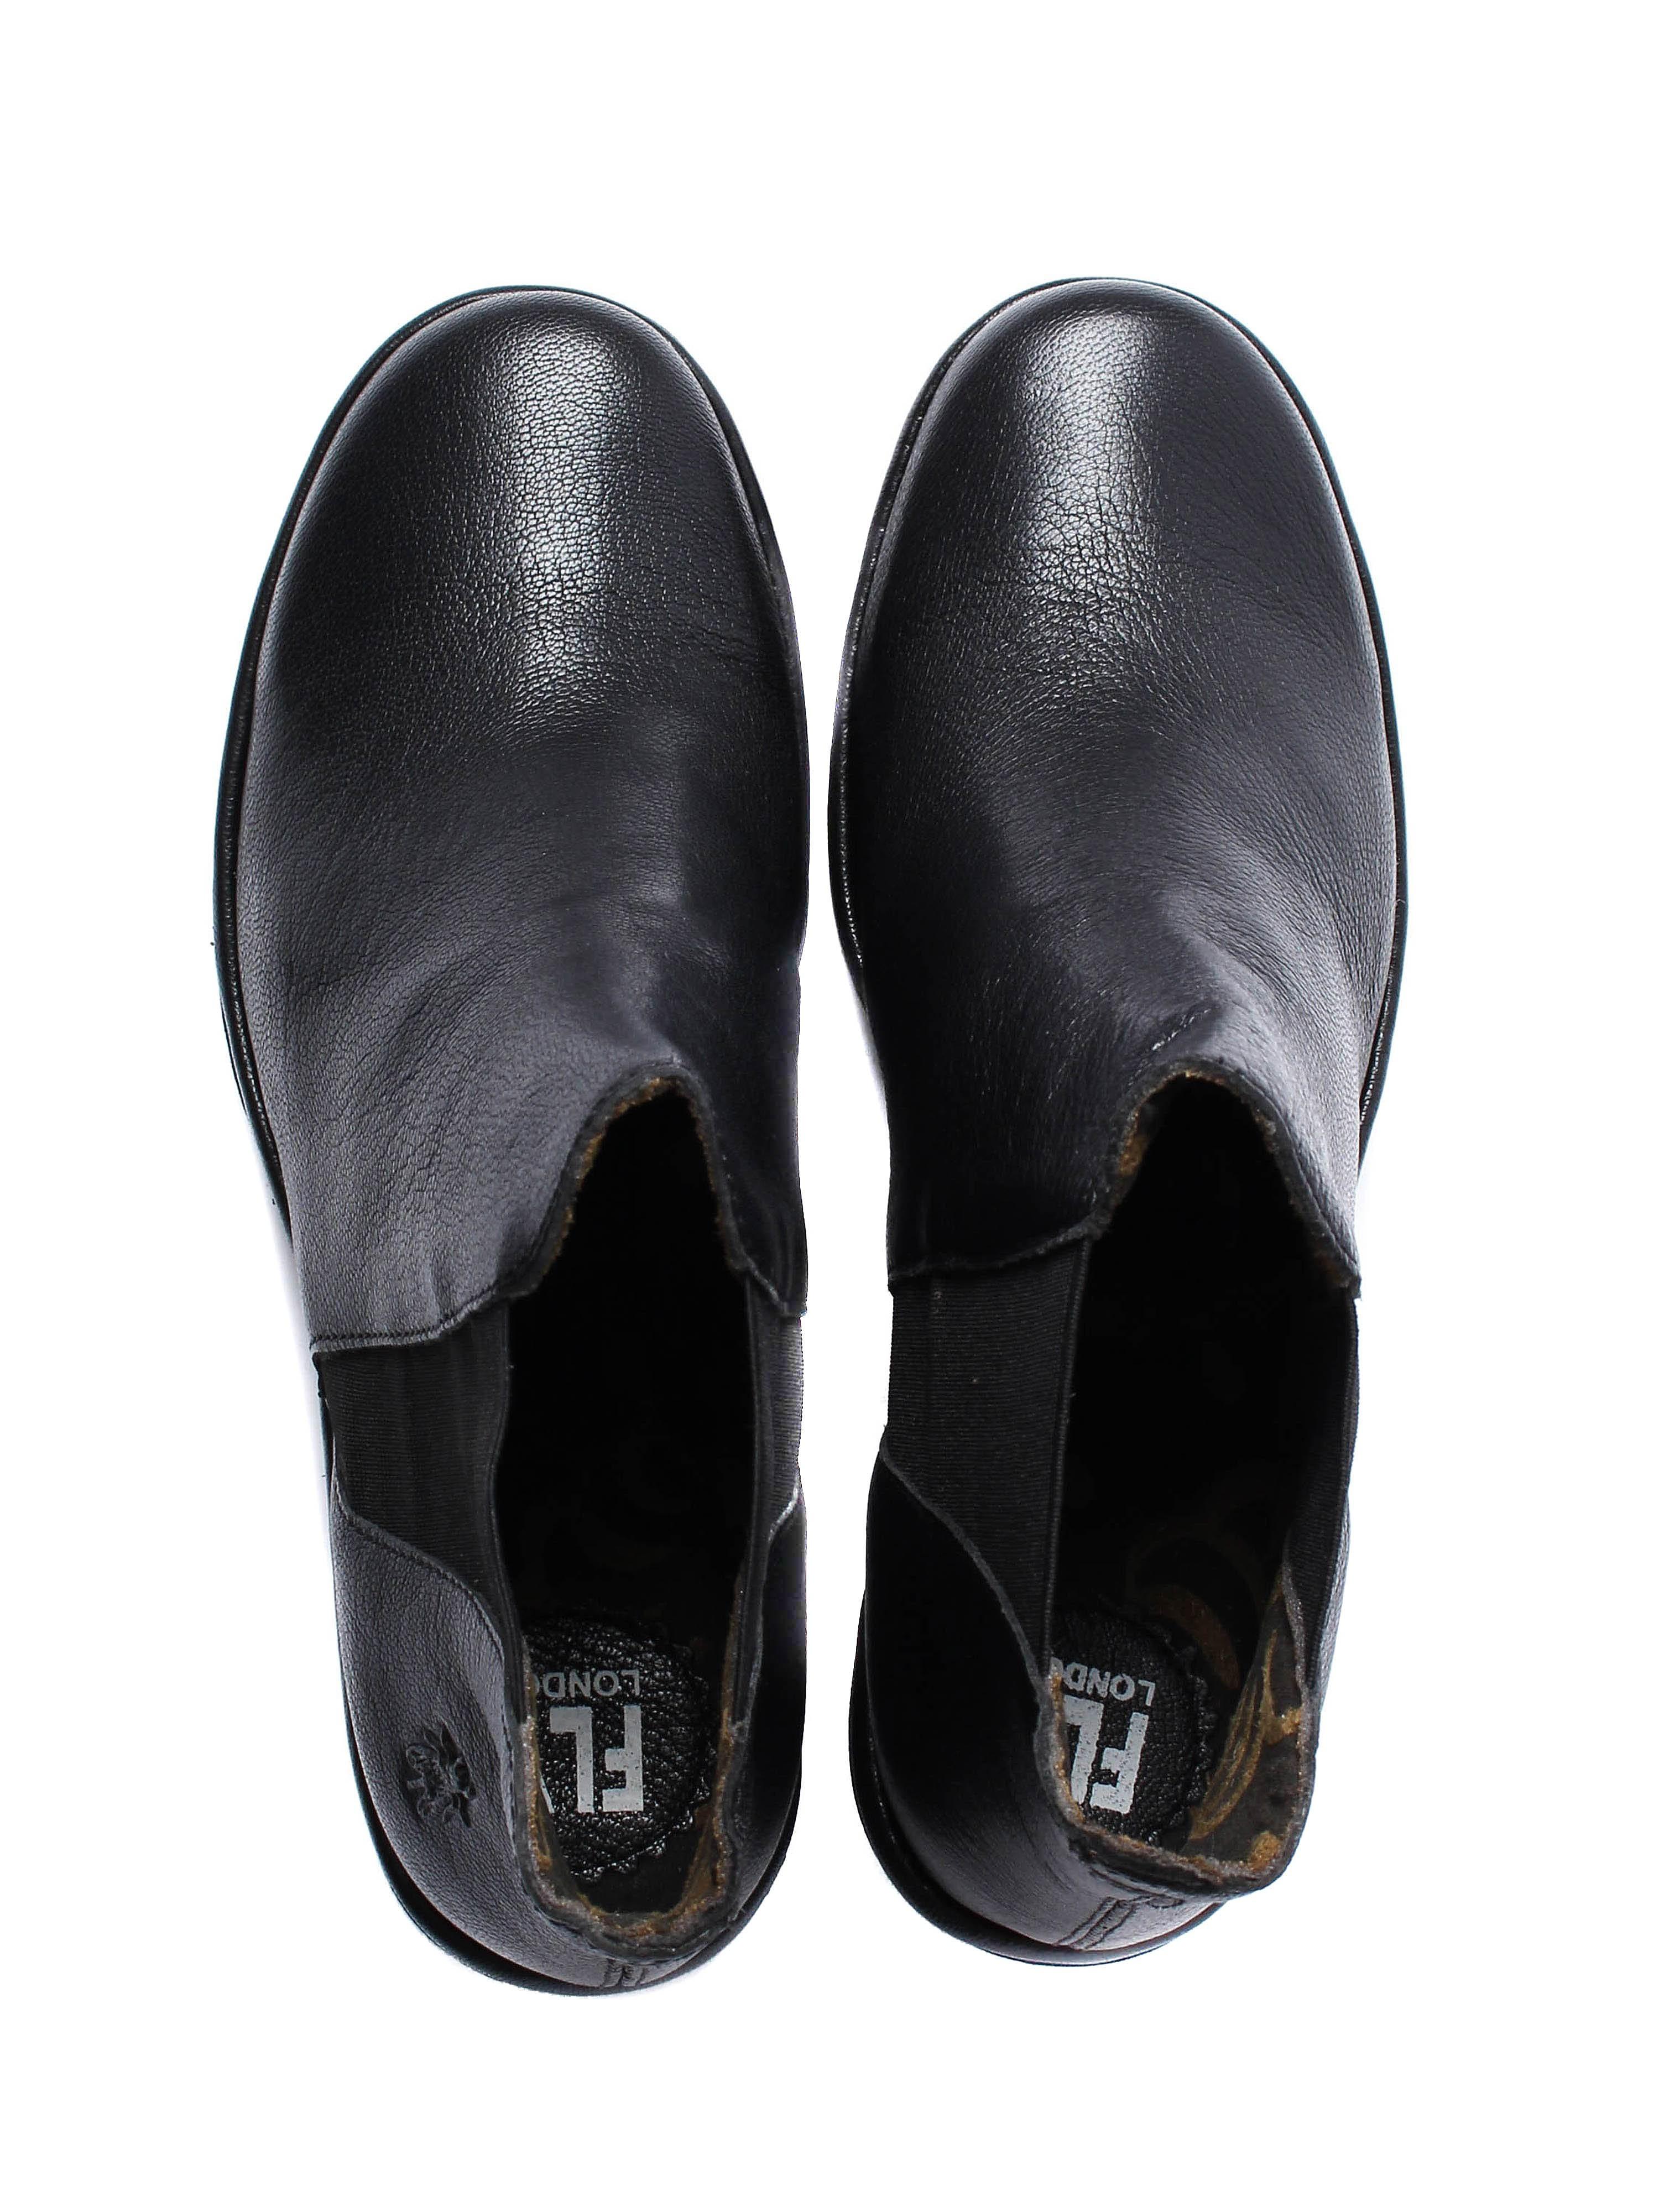 Fly London Women's Yoss Chelsea Boots - Black Leather